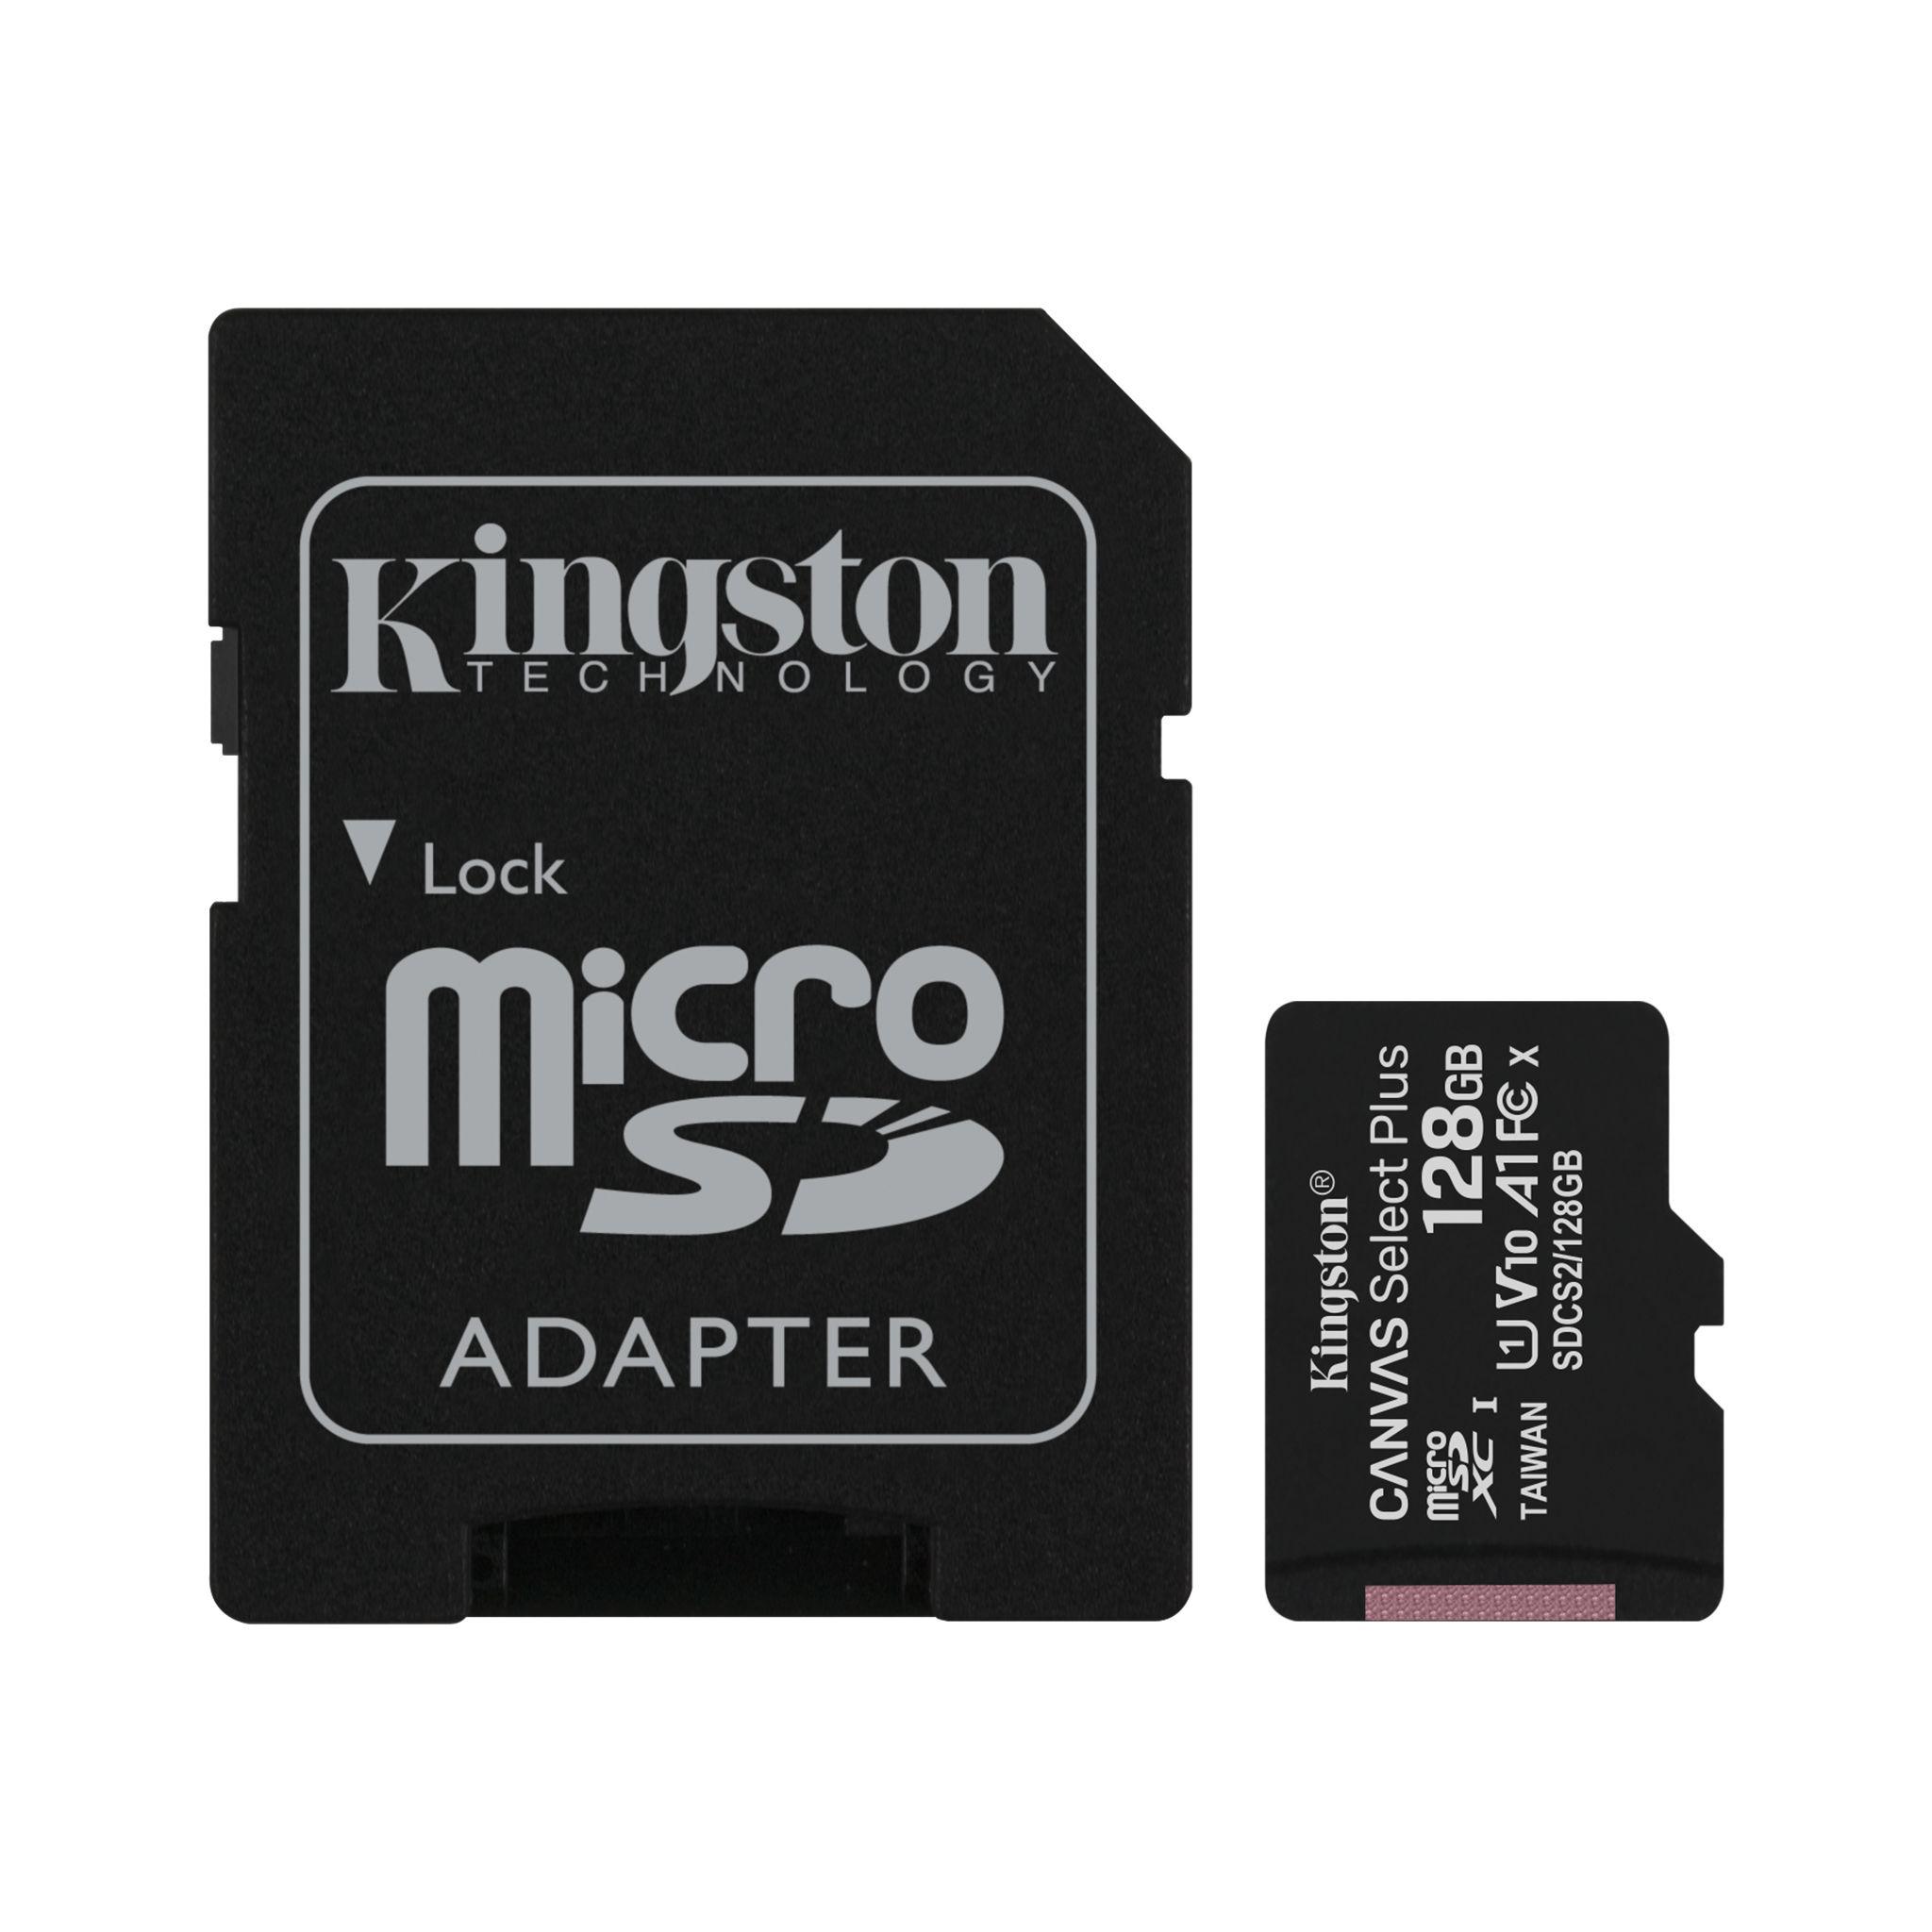 Original tarjeta de memoria Kingston micro SD 8-256 gb para bluboo dual